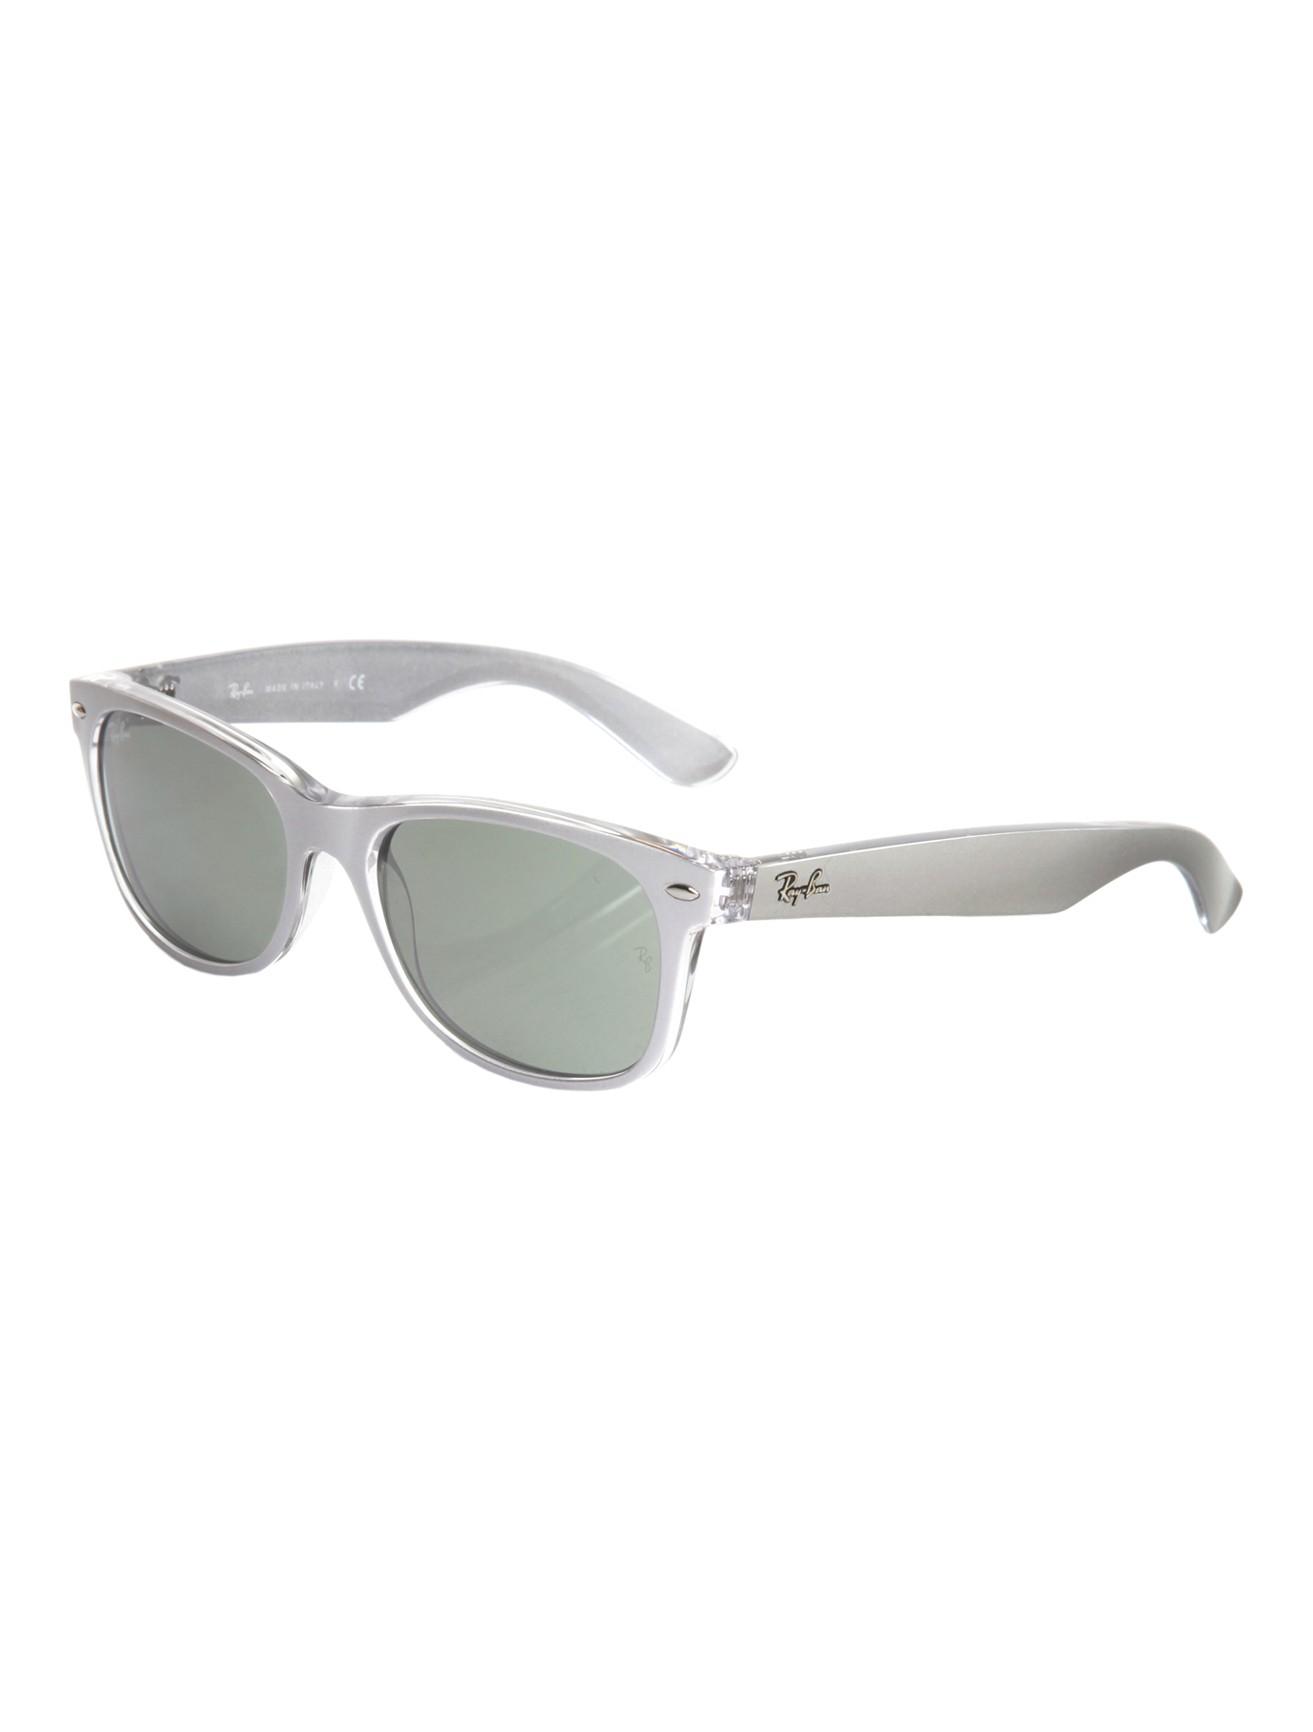 Clear Frame Ray Ban Wayfarer Glasses : Ray-ban Clear Wayfarer Sunglasses in Silver Lyst